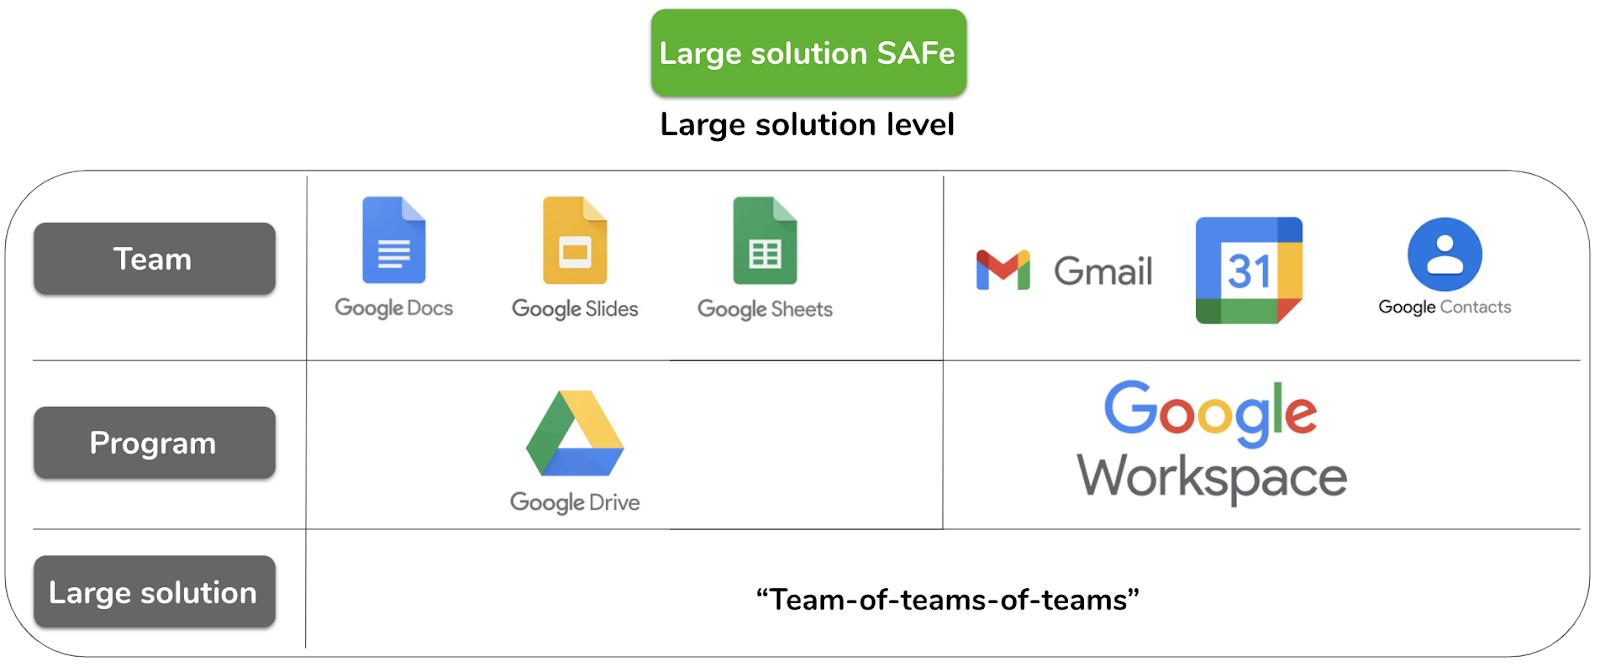 Large solution SAFe scaled agile framework example | Echometer